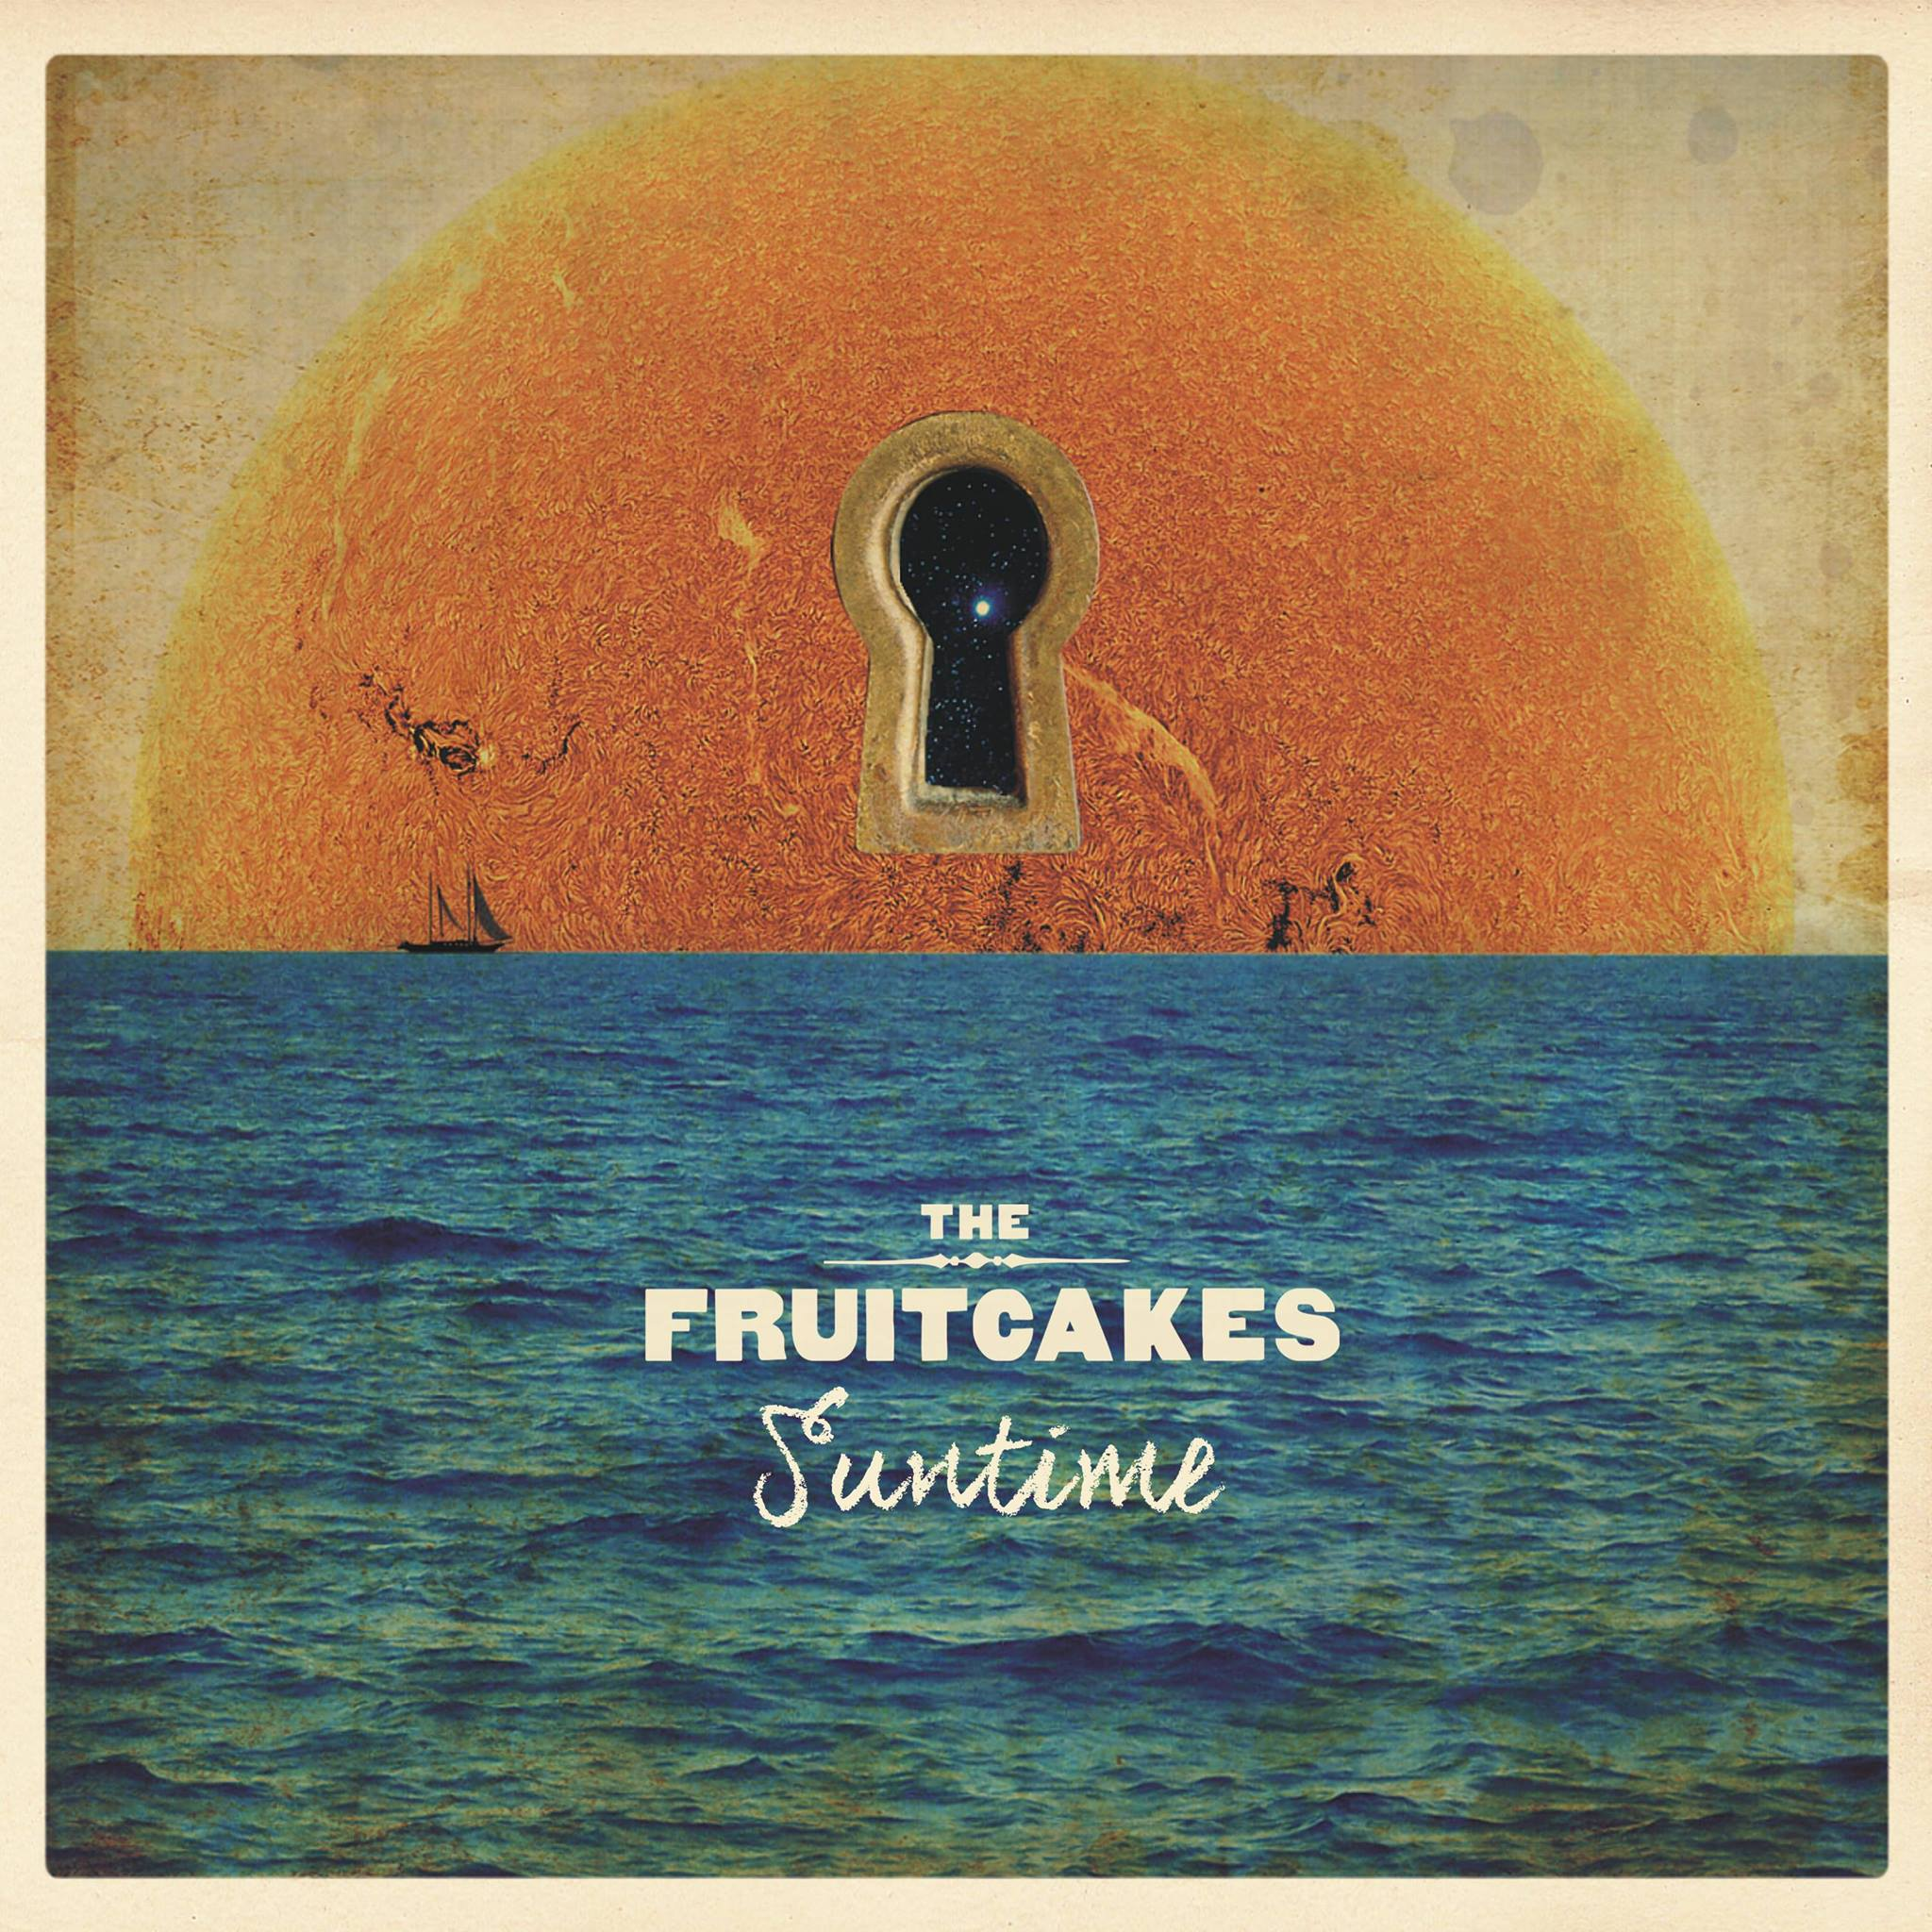 The Fruitcakes 3 / koncert